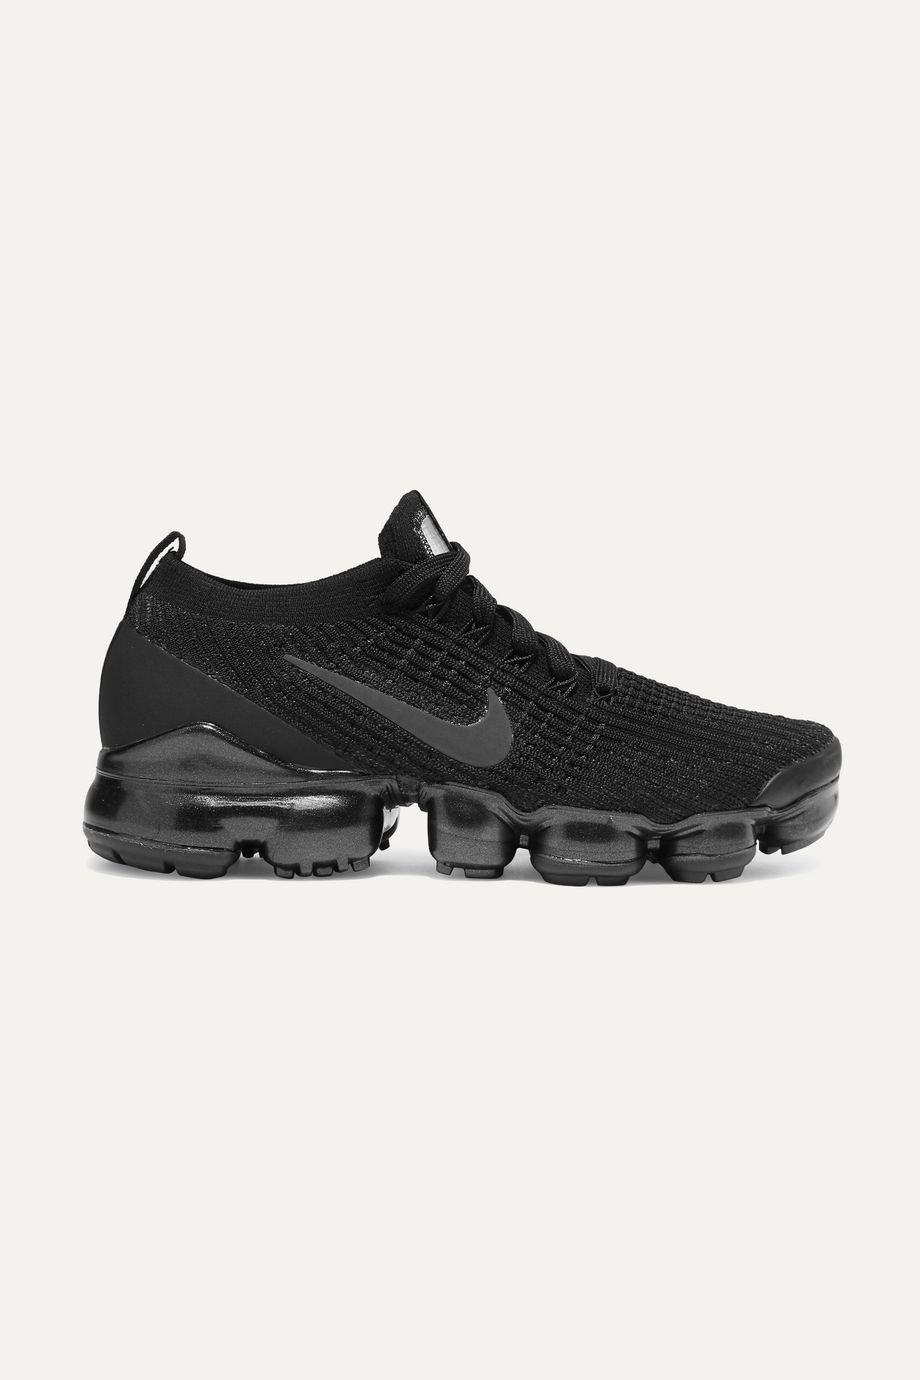 Nike Air VaporMax 3 Flyknit sneakers